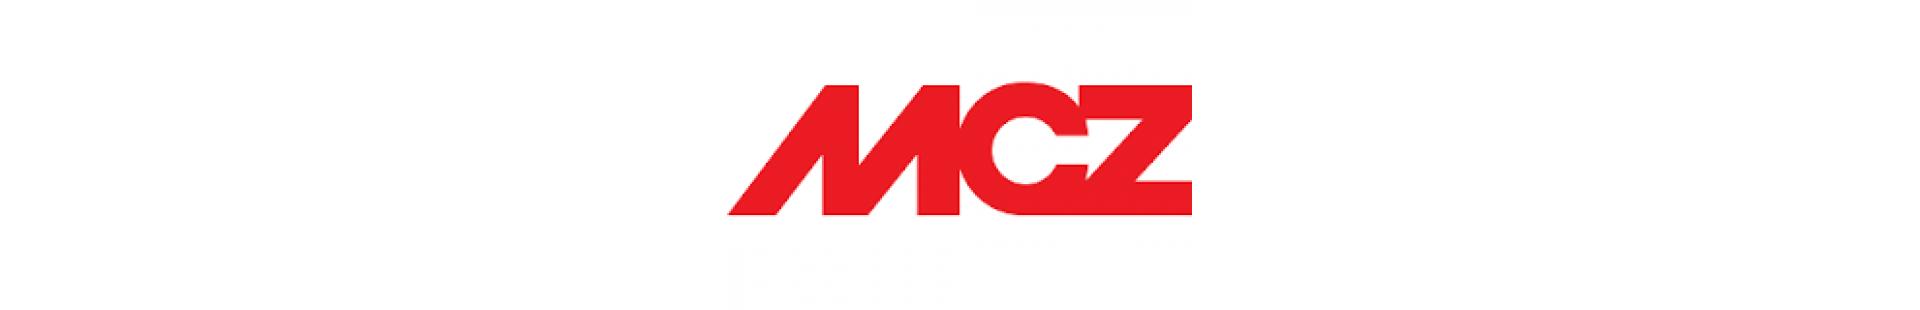 Камины MCZ (Италия)